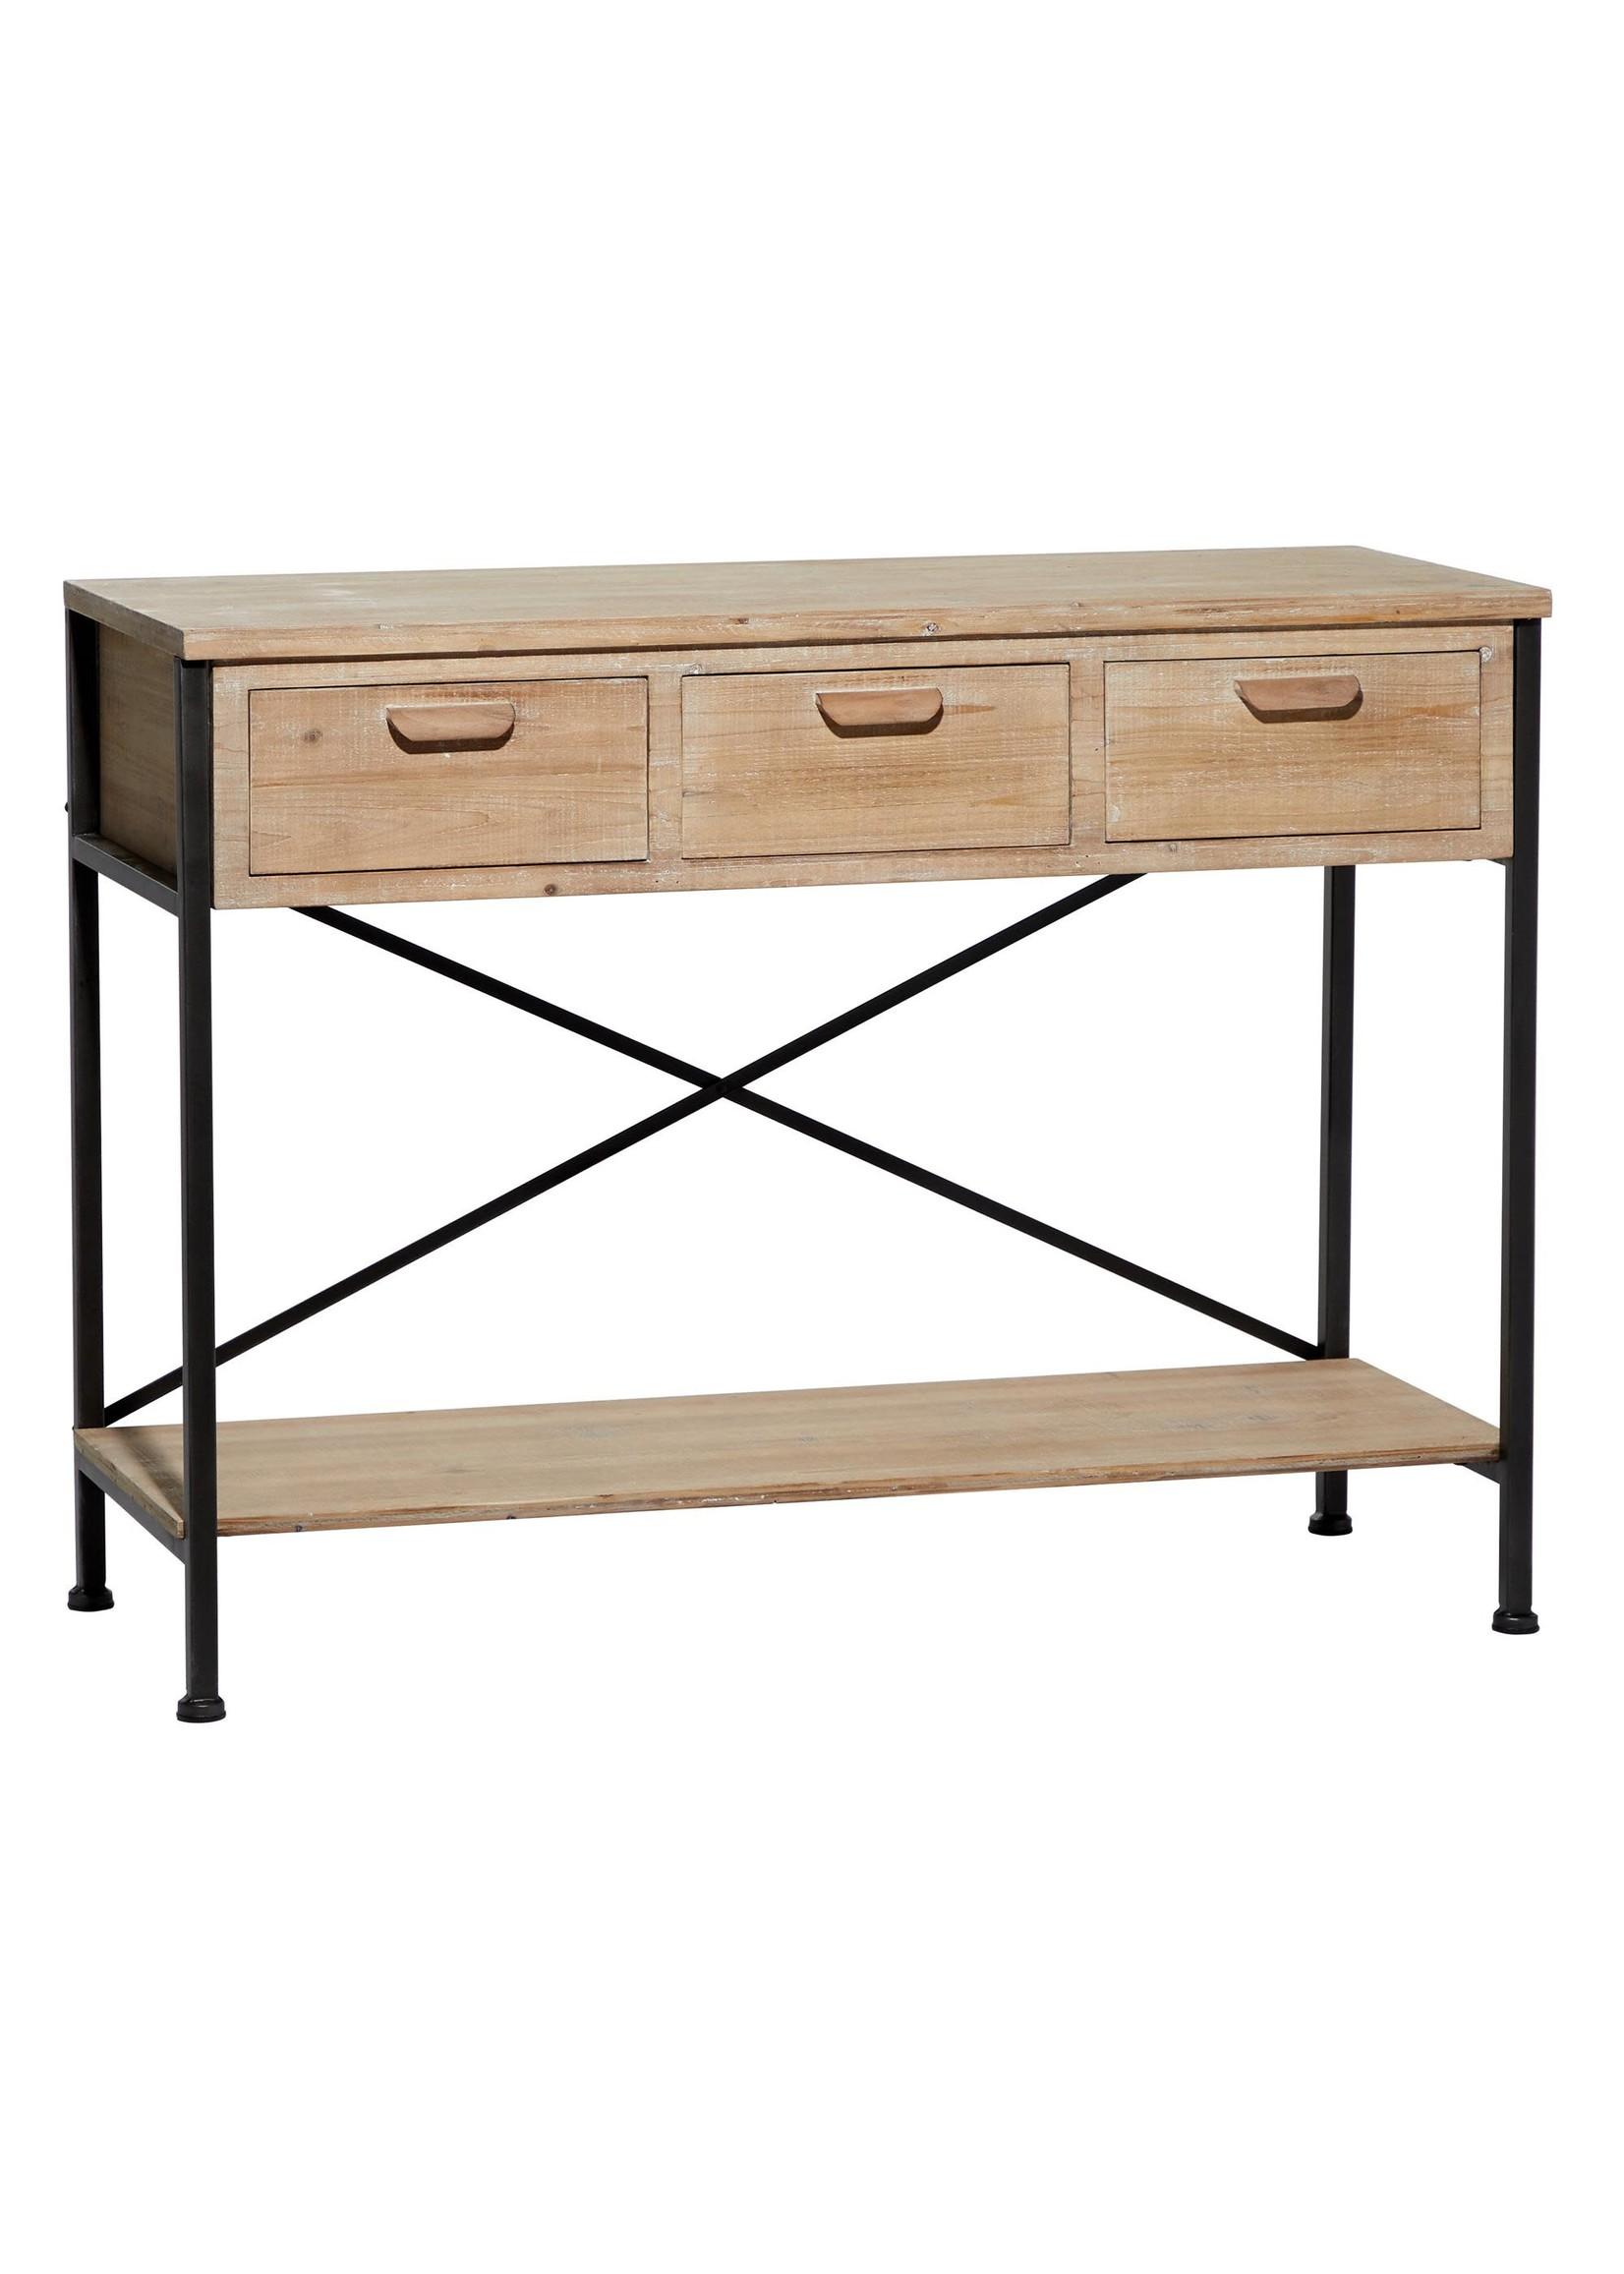 UMA Enterprises Wood Metal Console Table